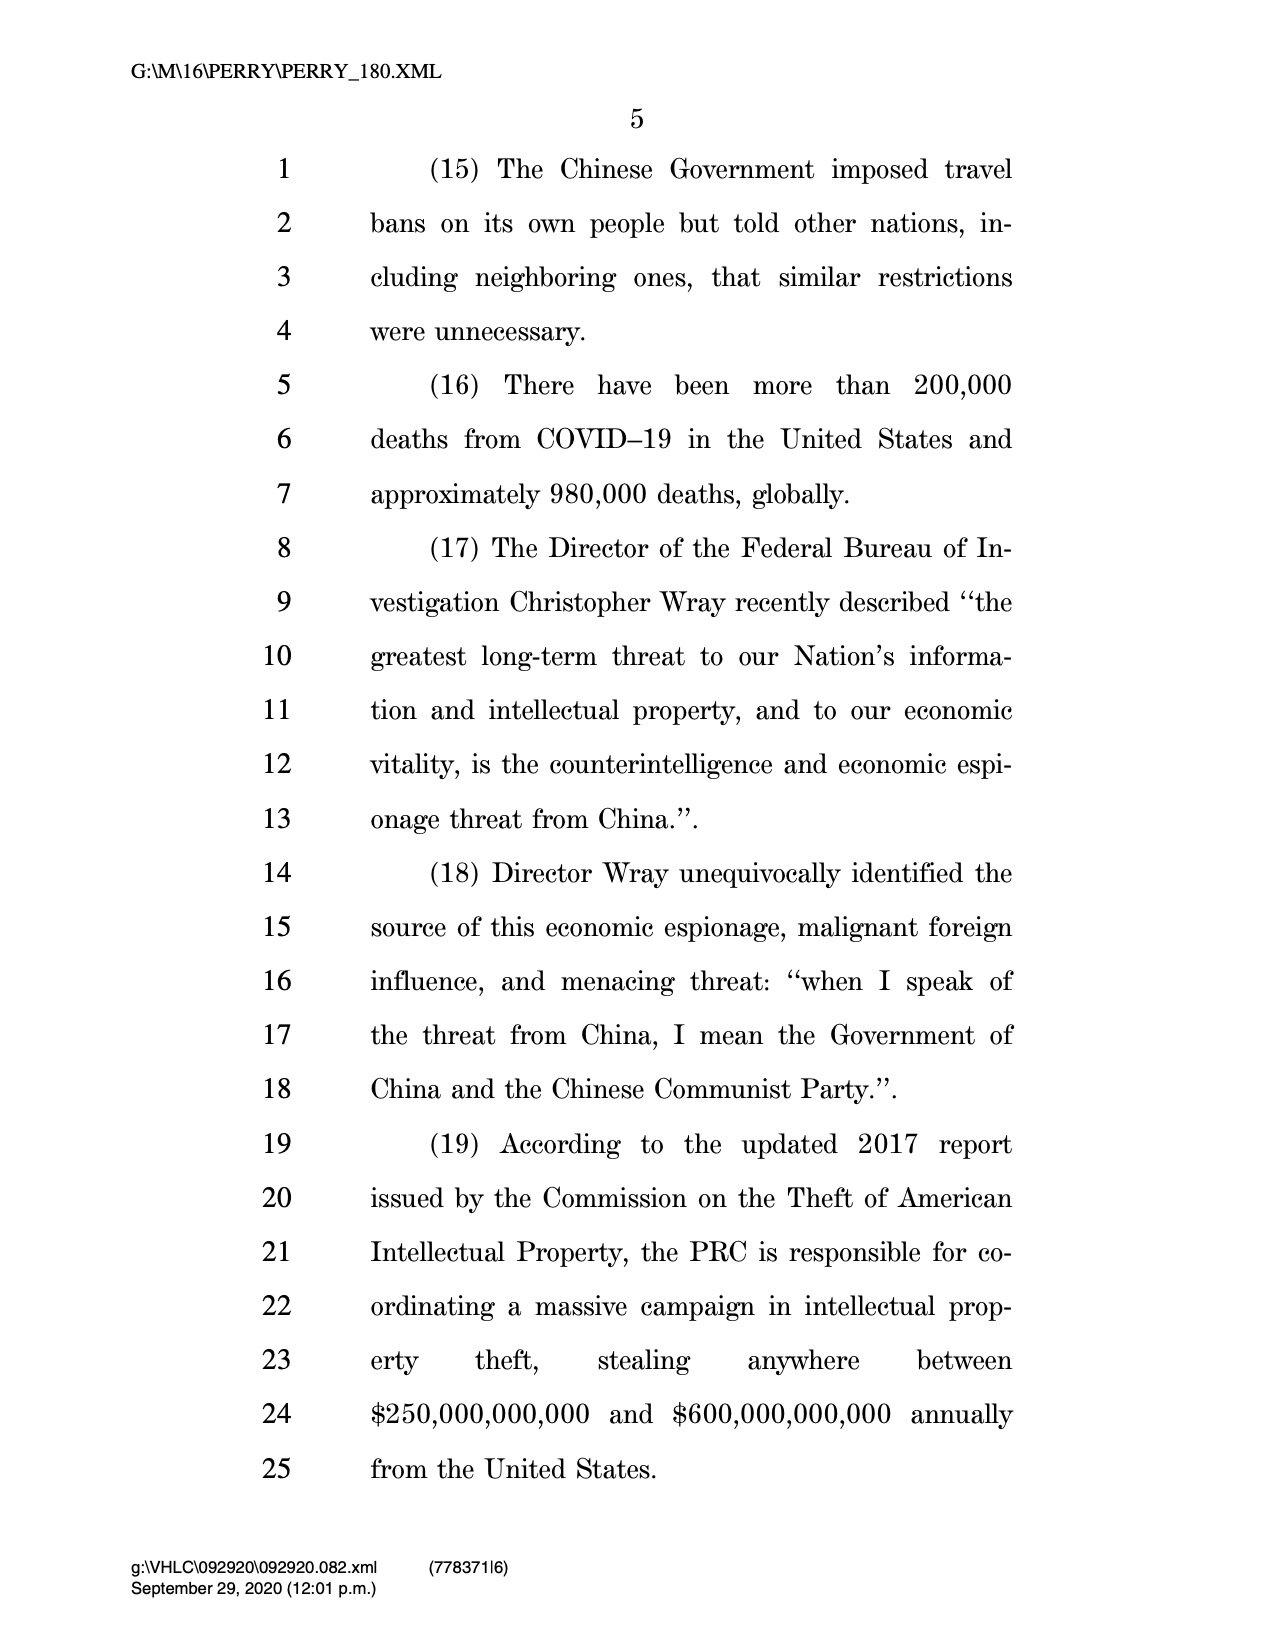 CCP as a TOC Bill - Final Edition5.jpg